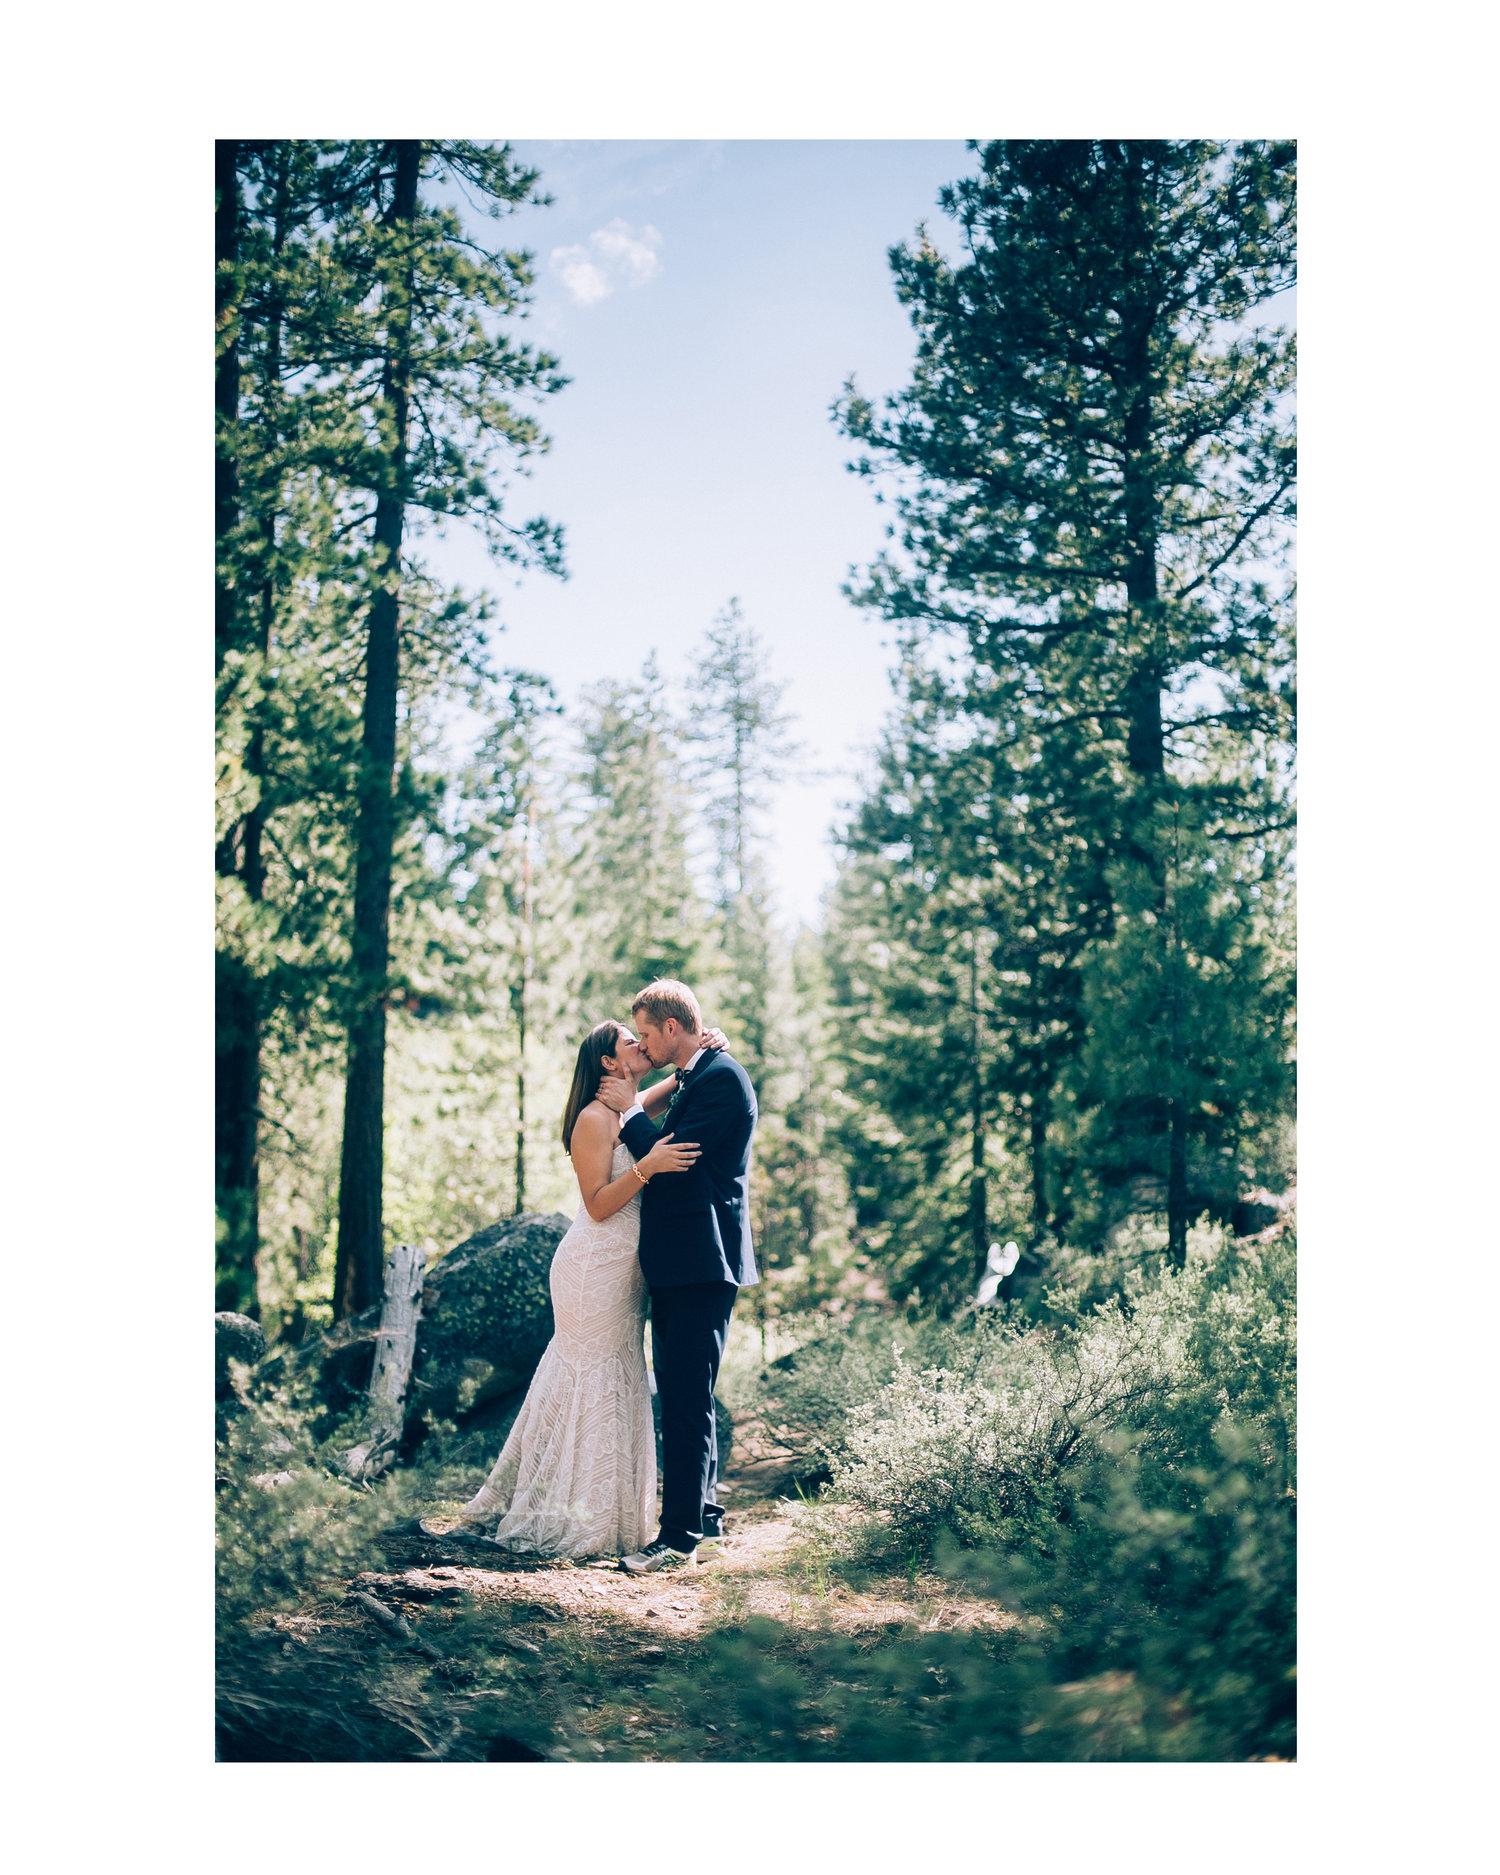 Melisa&David_Wedding_Day_026.jpg